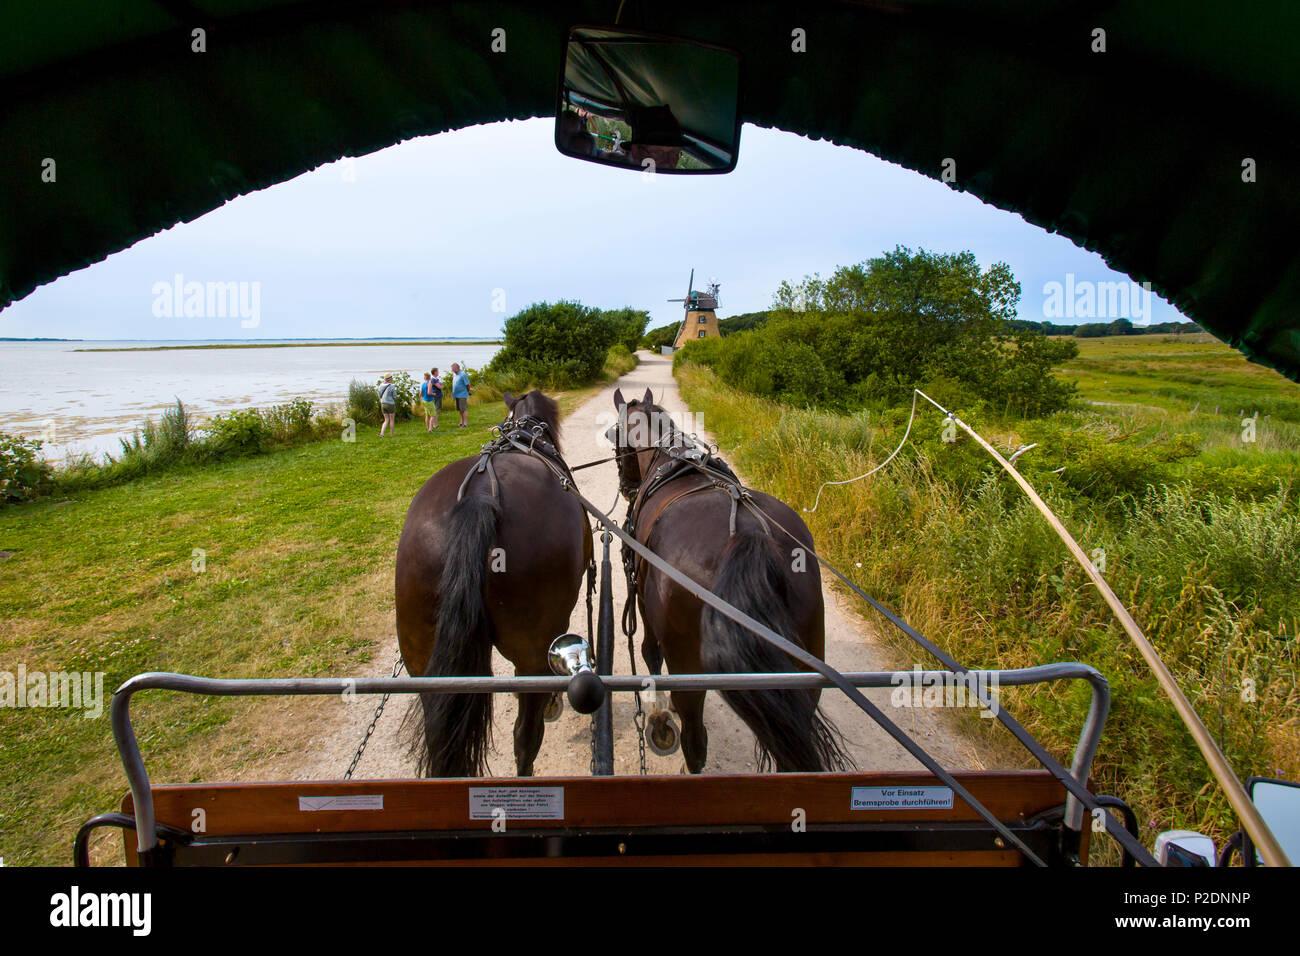 Horse carriage ride through the Geltinger Birk, Baltic Coast, Schleswig-Holstein, Germany - Stock Image